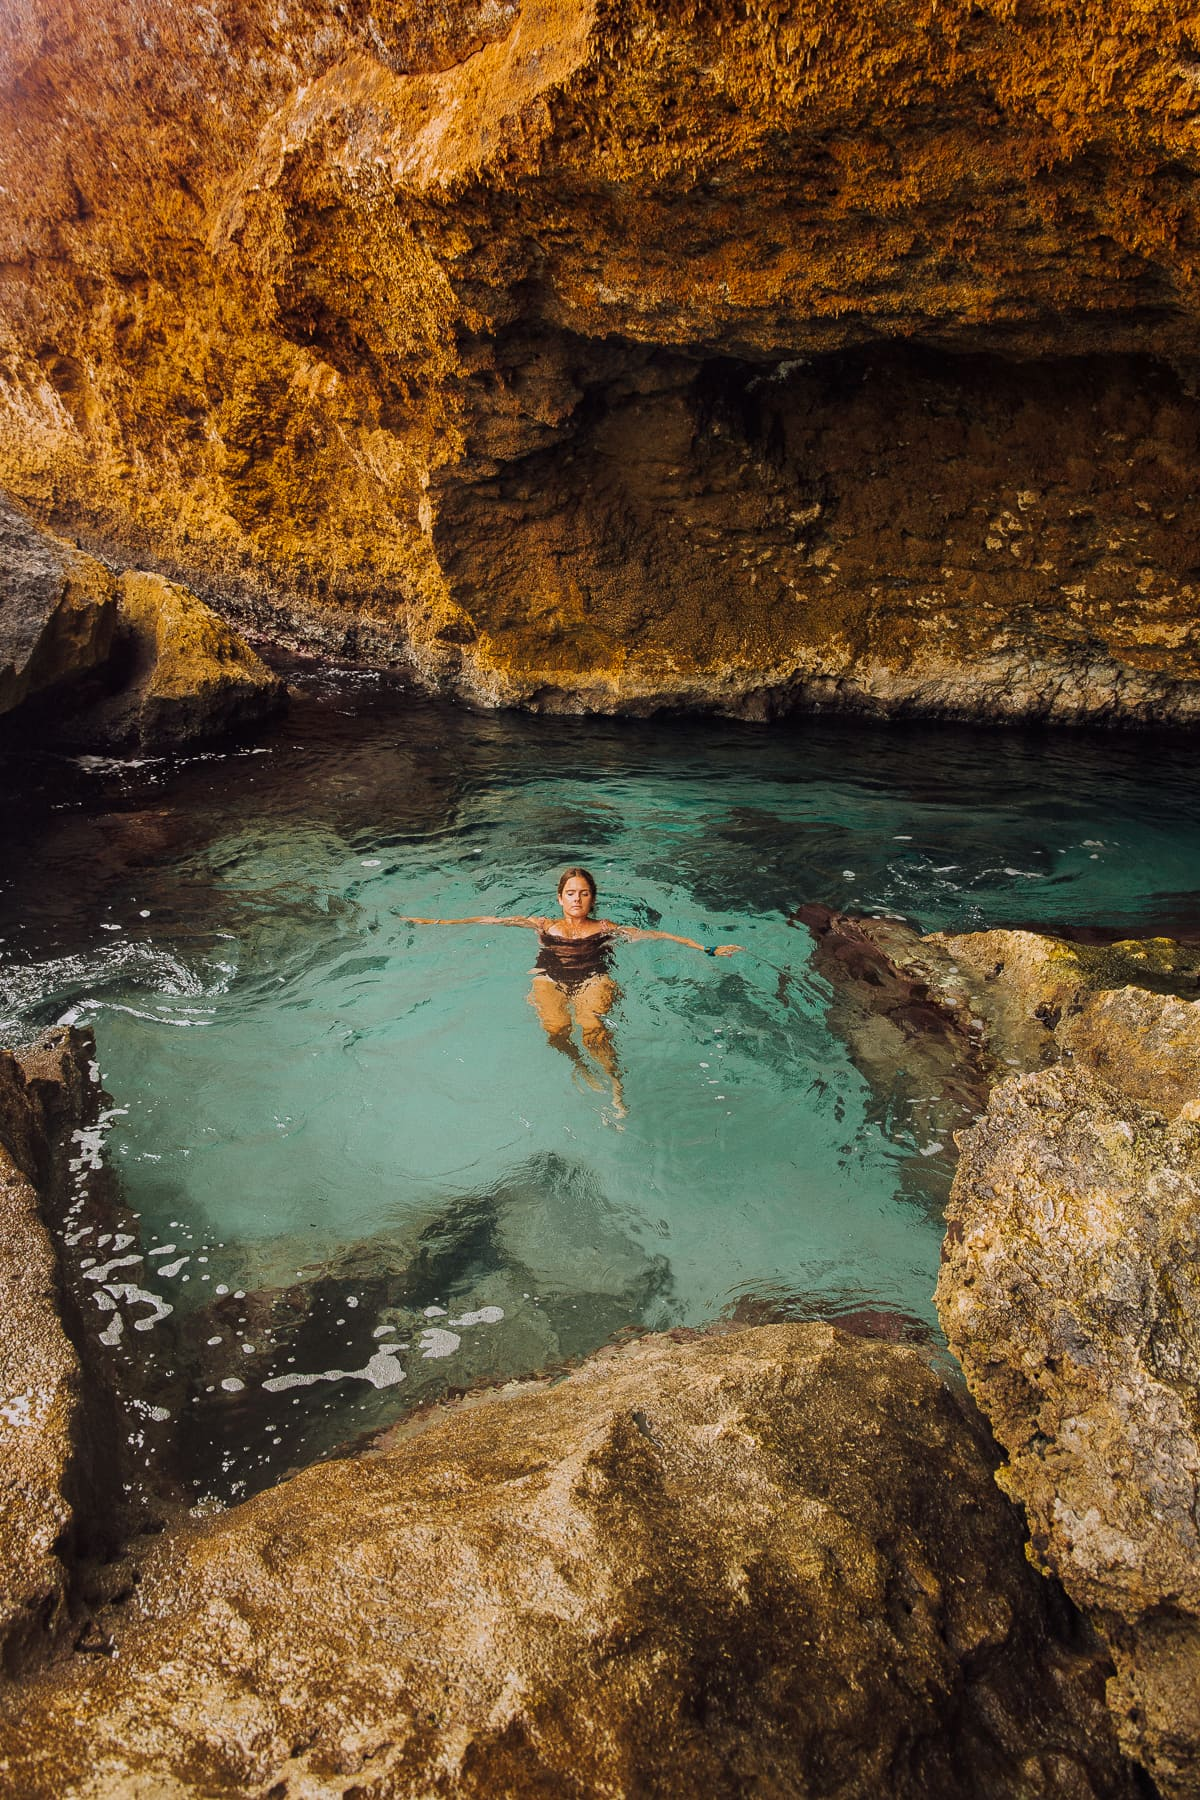 Conchi Natural Pool auf Aruba an der Nordküste der Karibikinsel